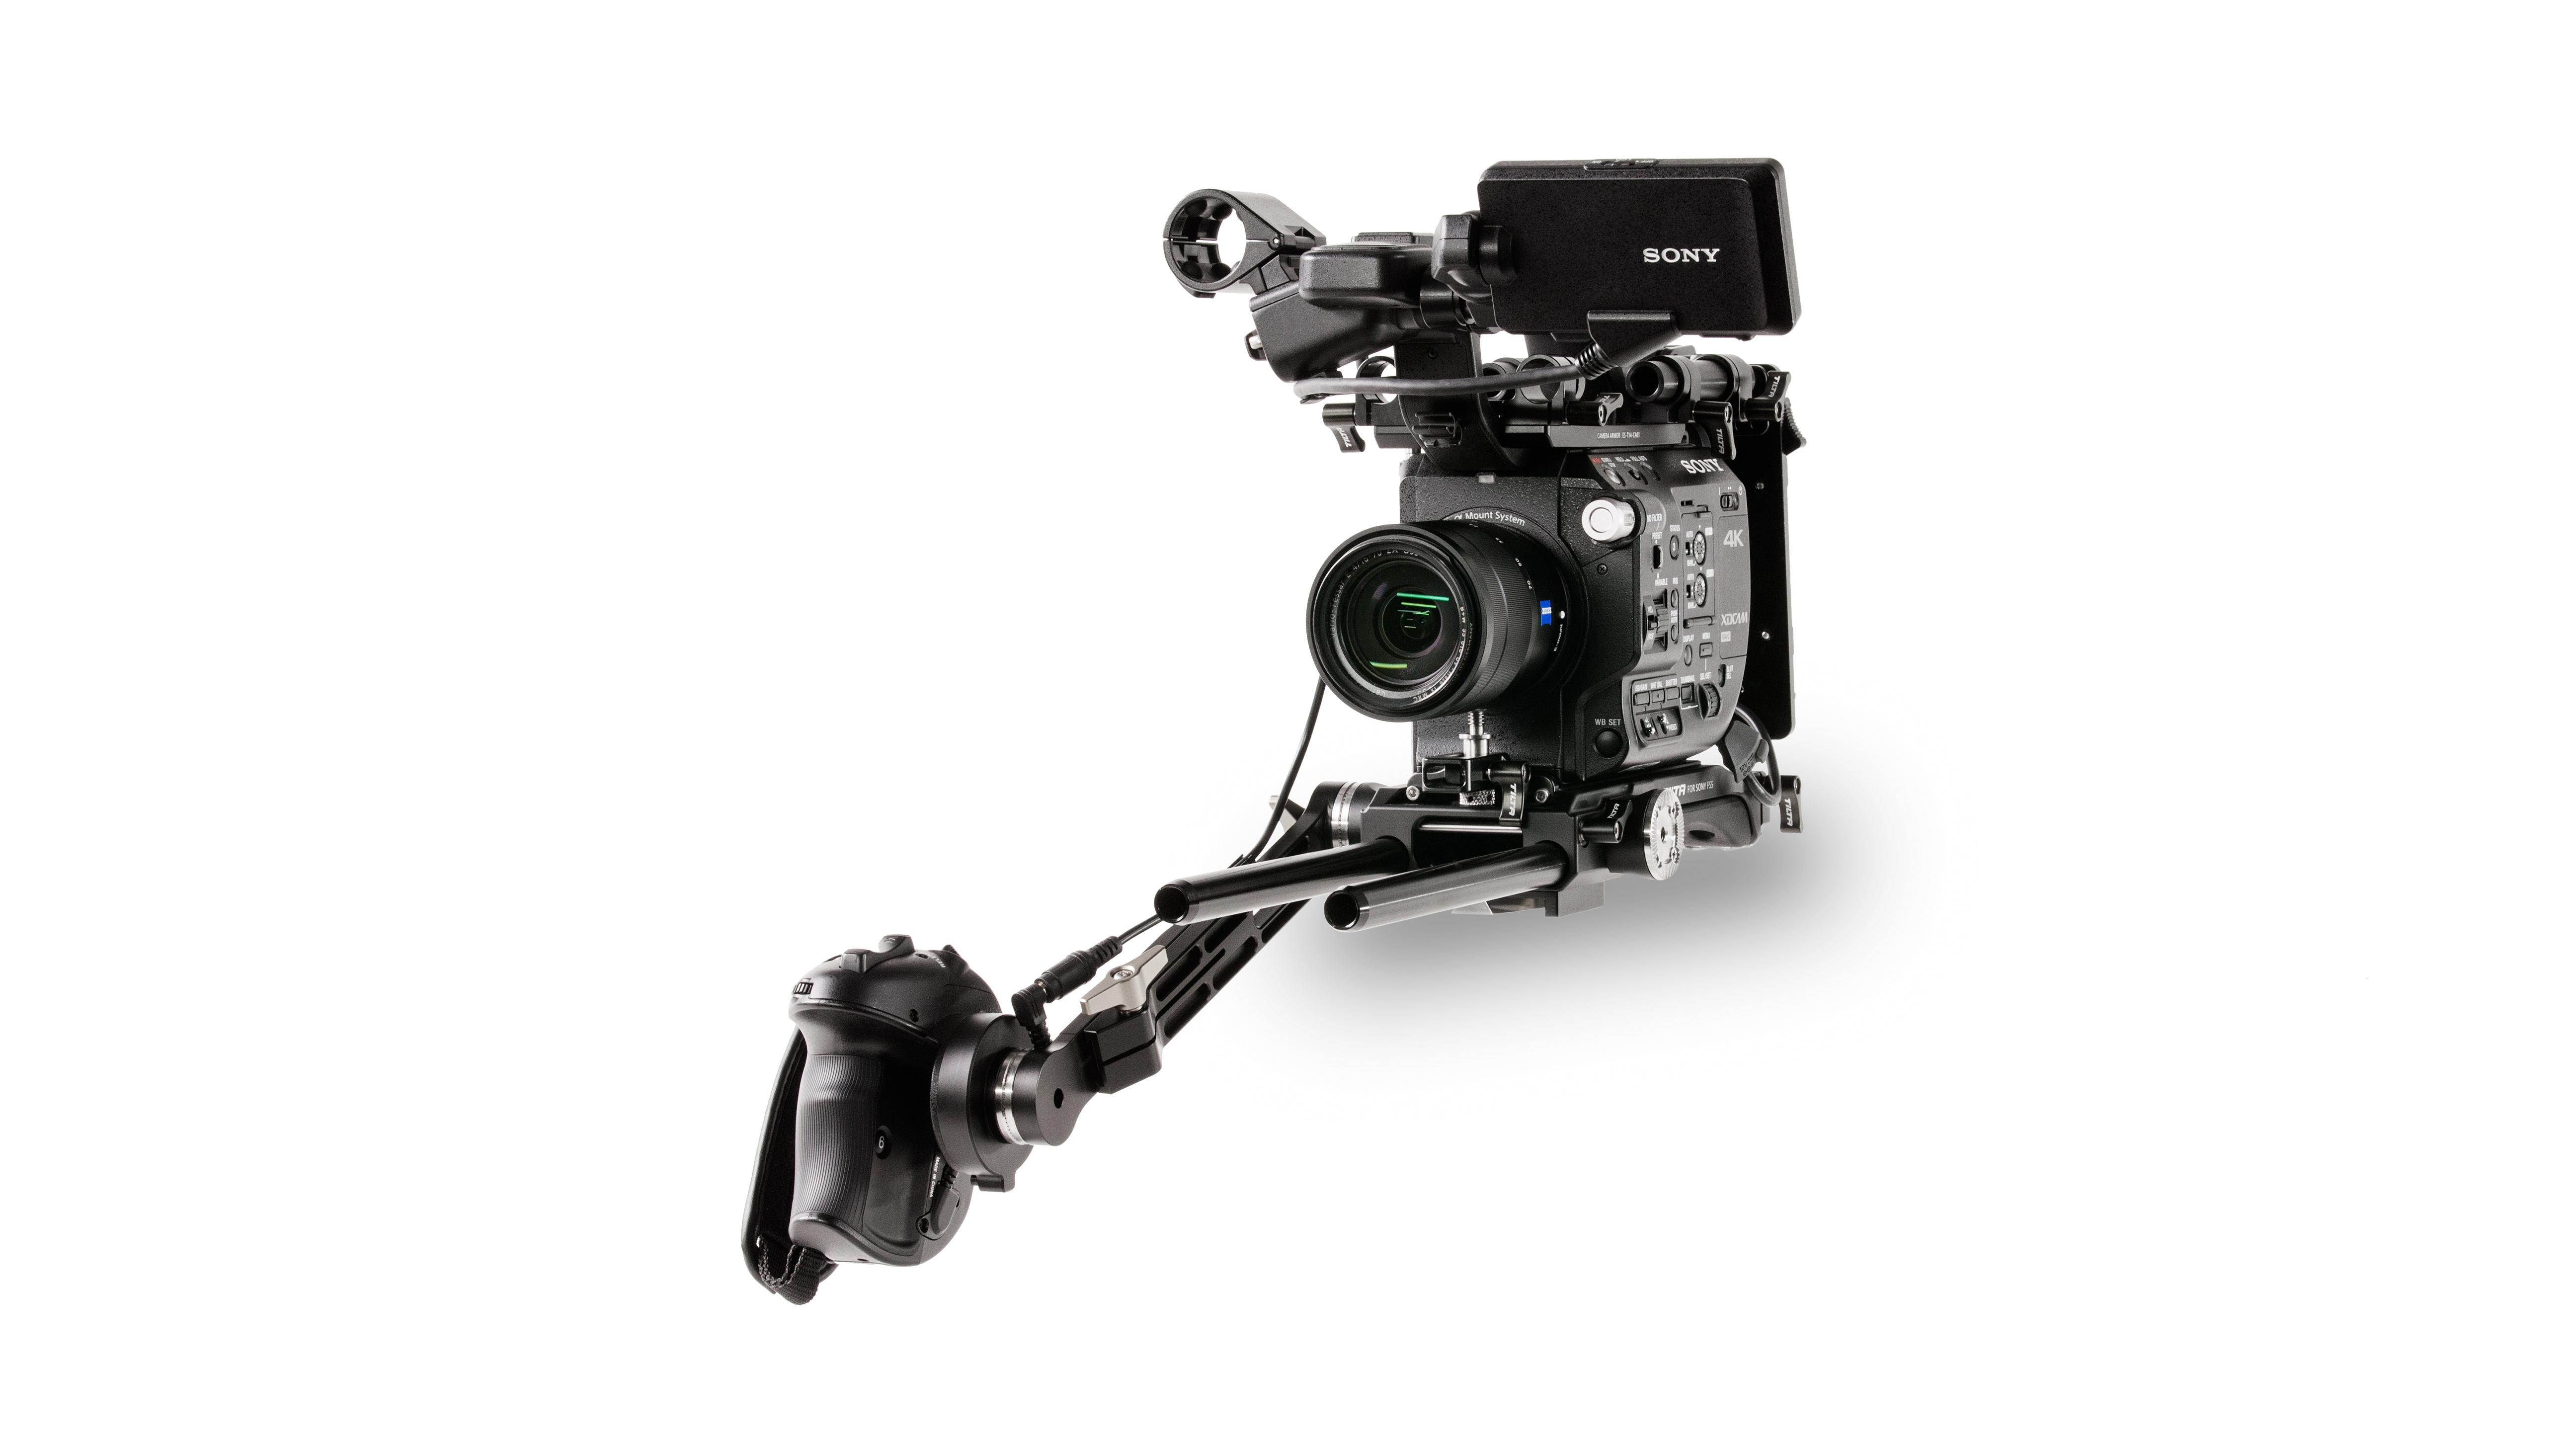 Camera Cage for Sony FS5 (Open Box)